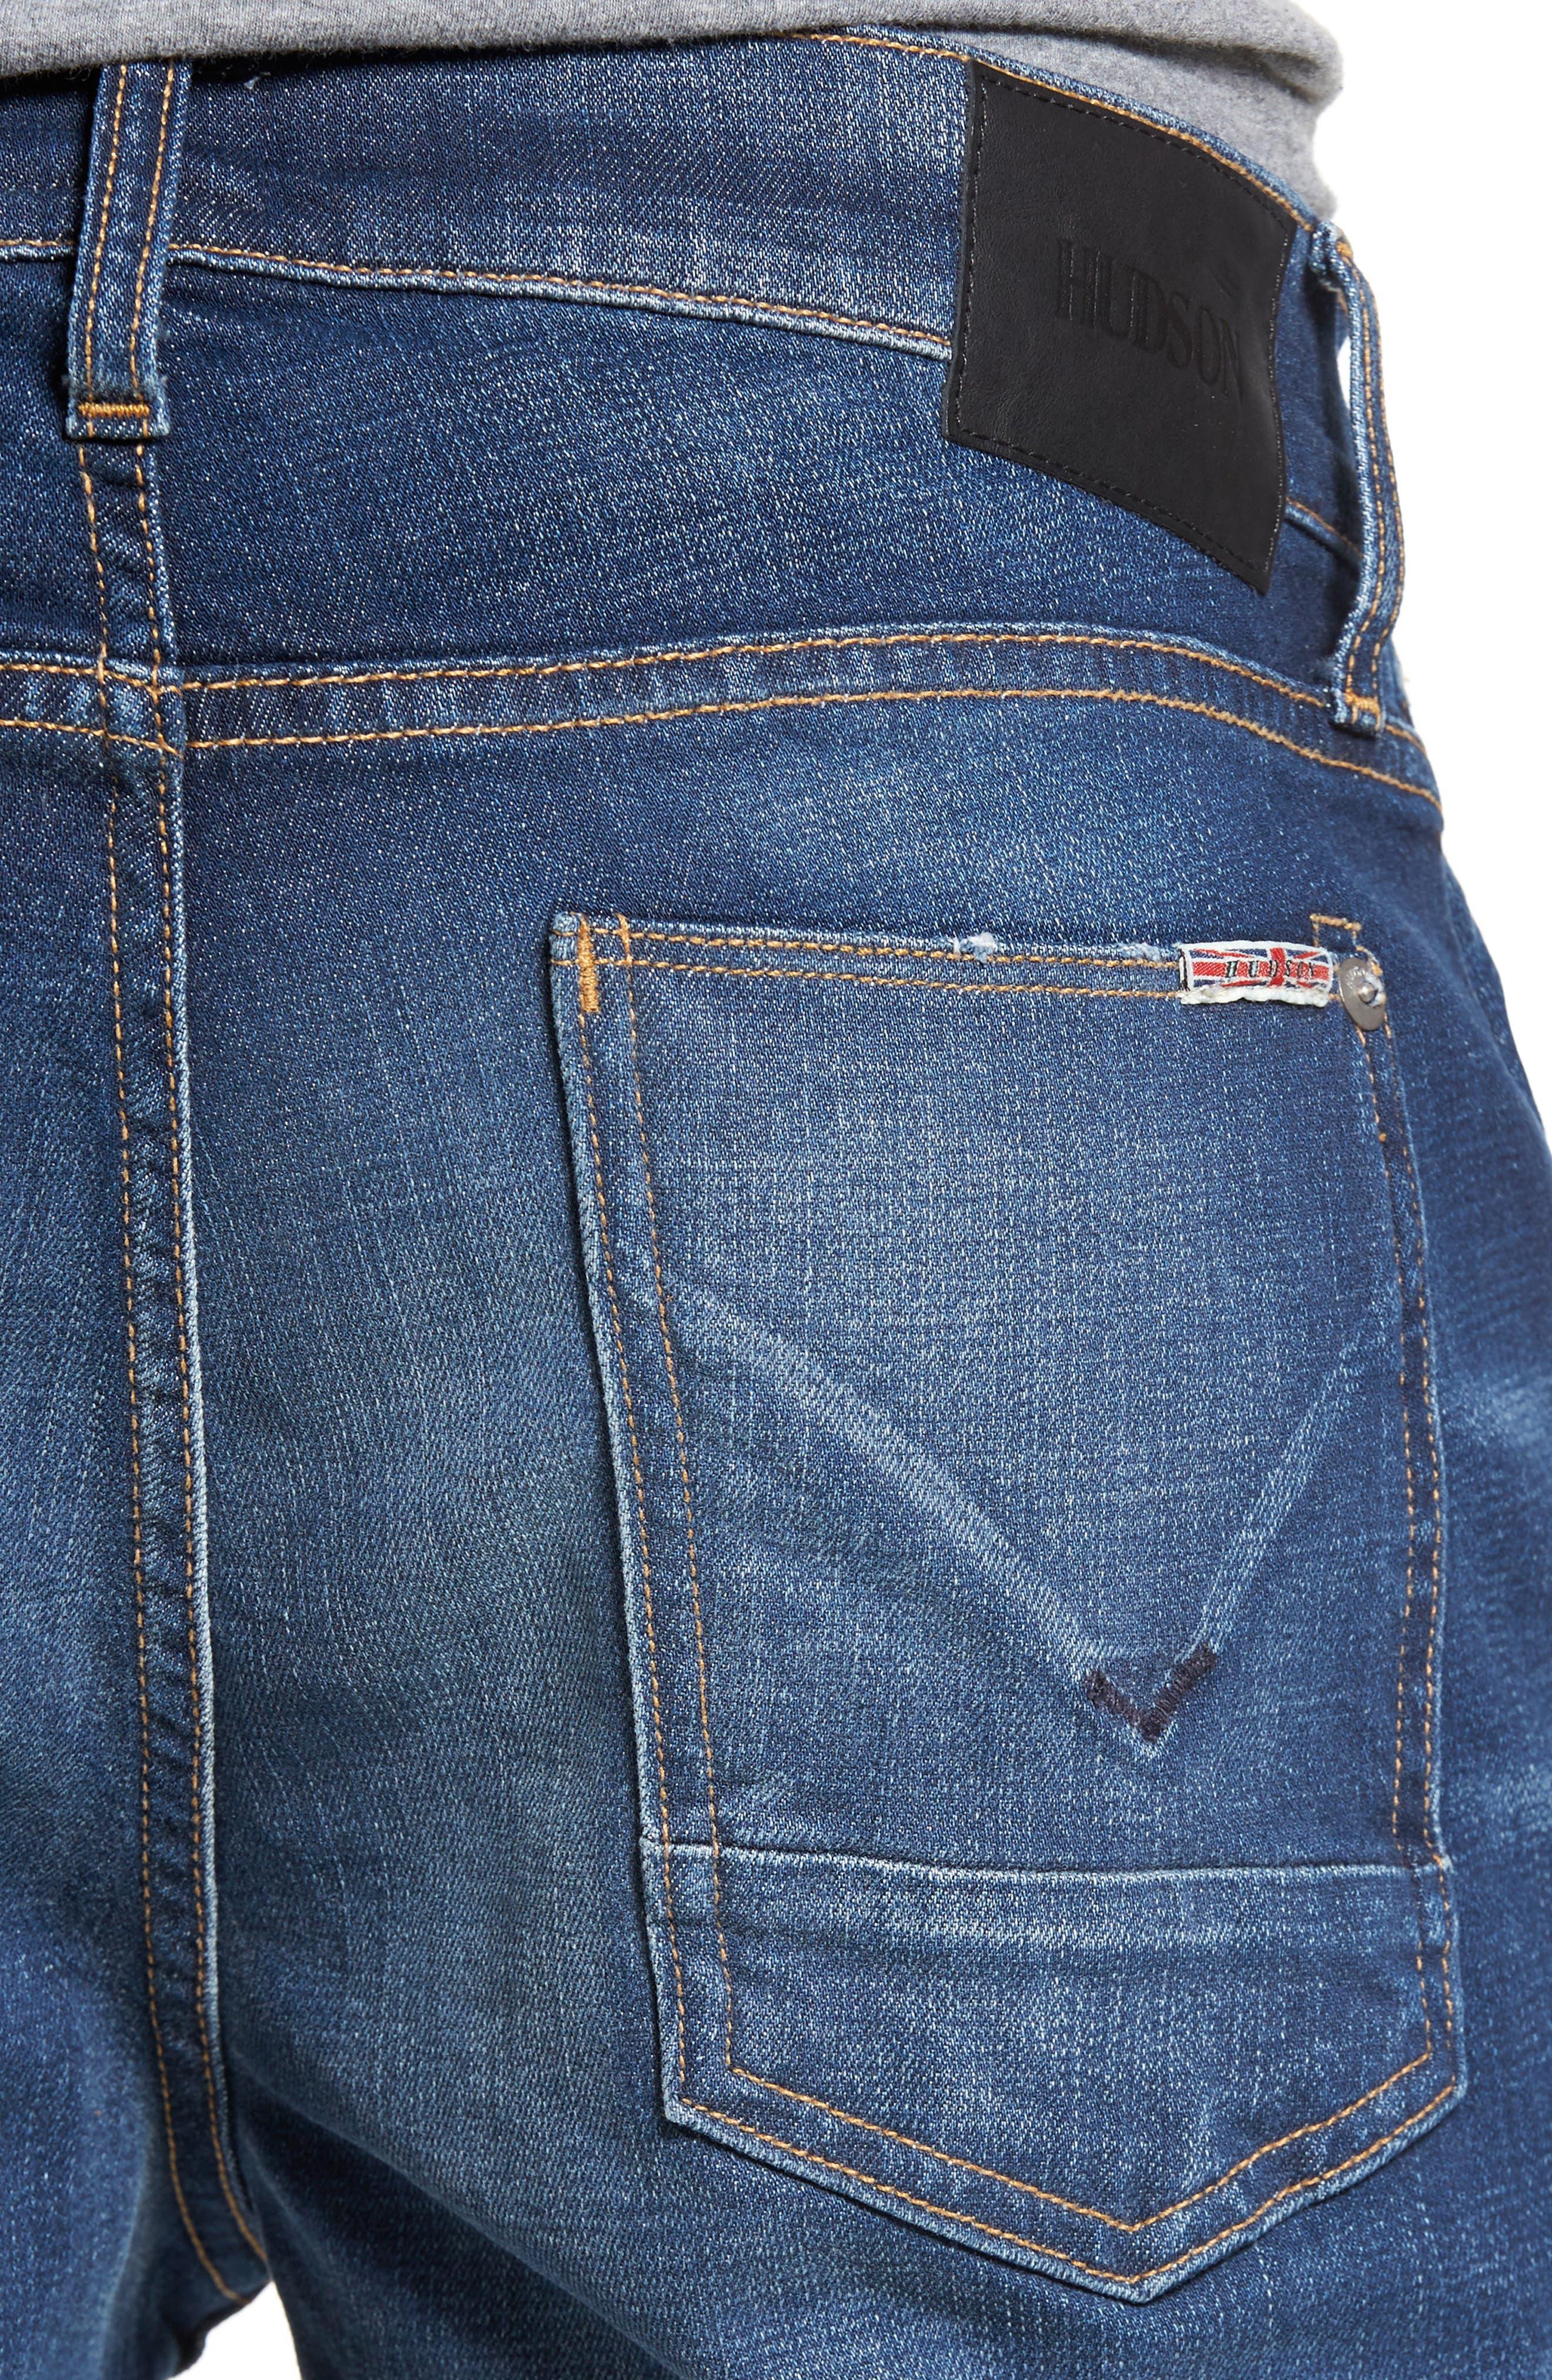 Blake Slim Fit Jeans,                             Alternate thumbnail 4, color,                             426